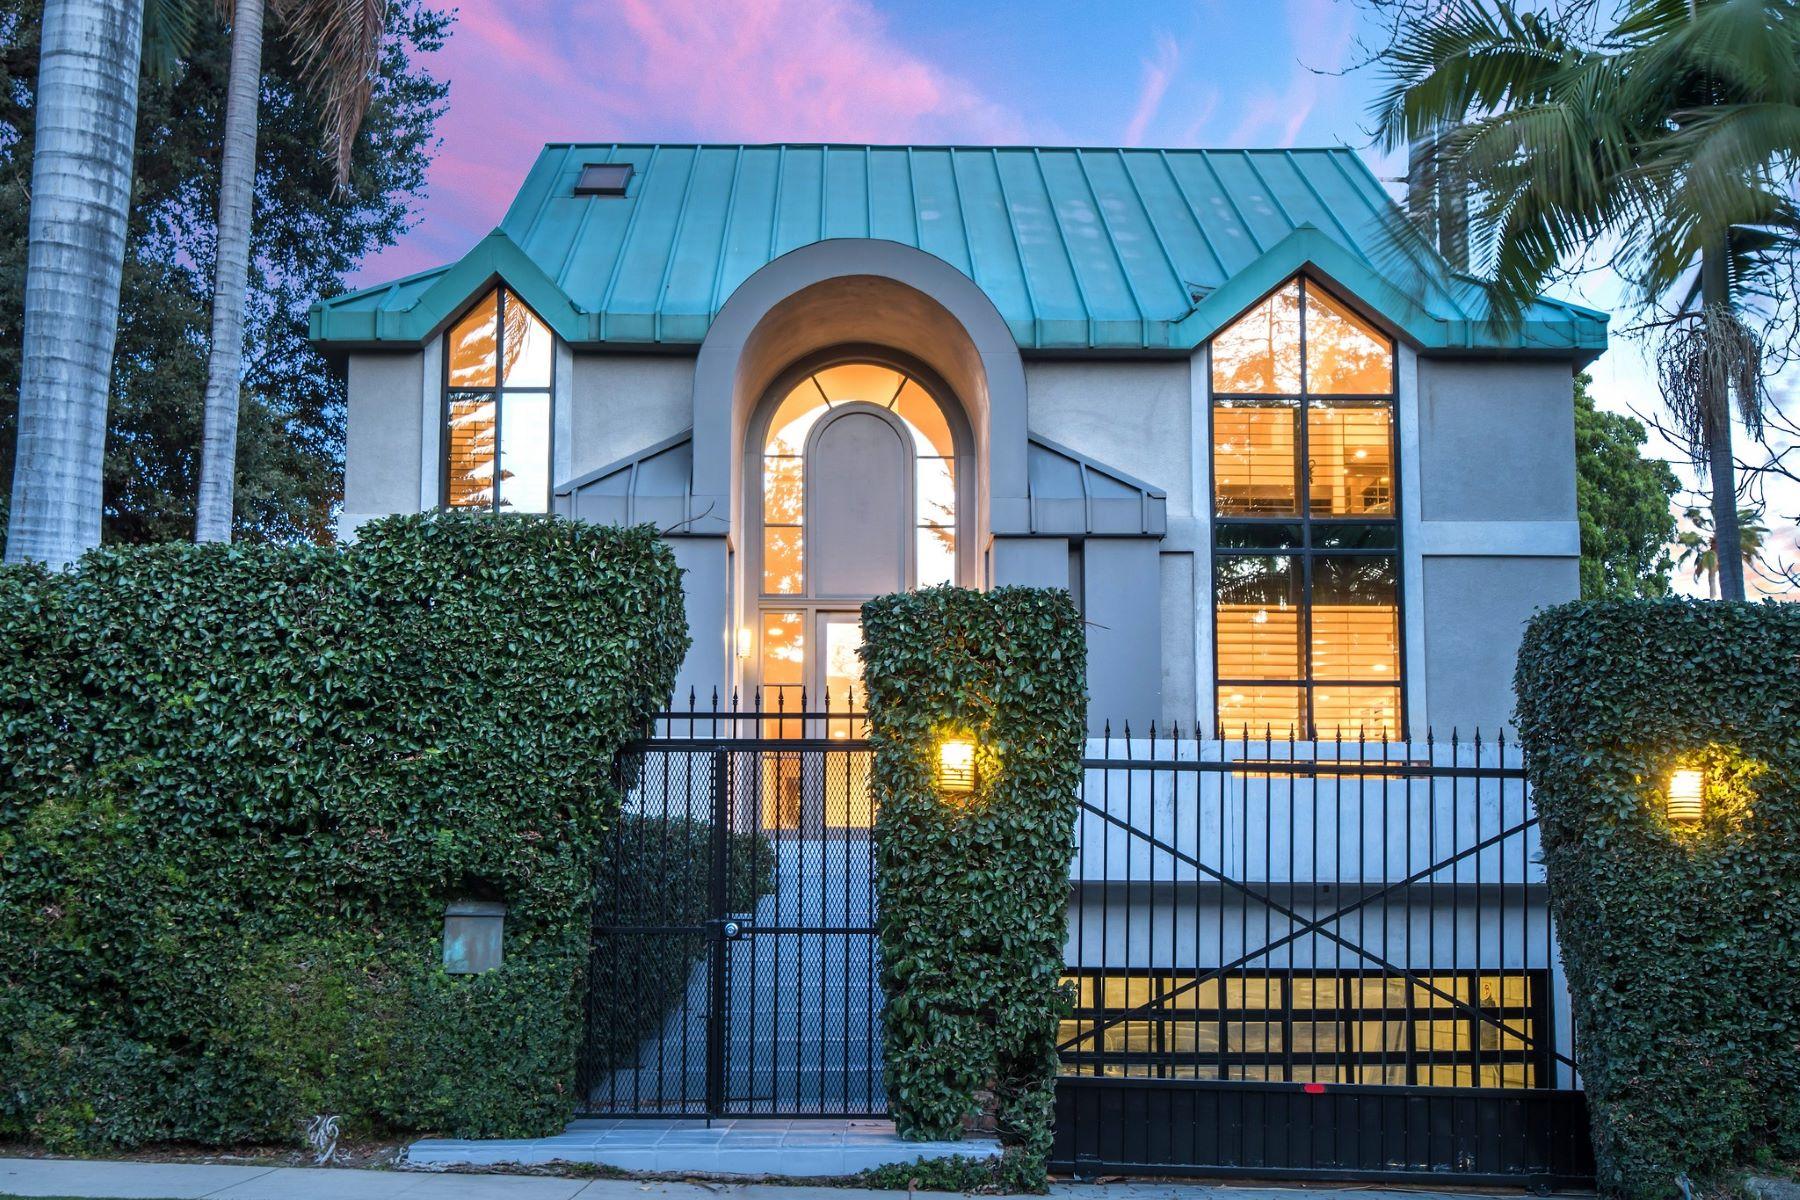 Single Family Homes for Sale at 4060 Kraft Avenue Studio City, California 91604 United States